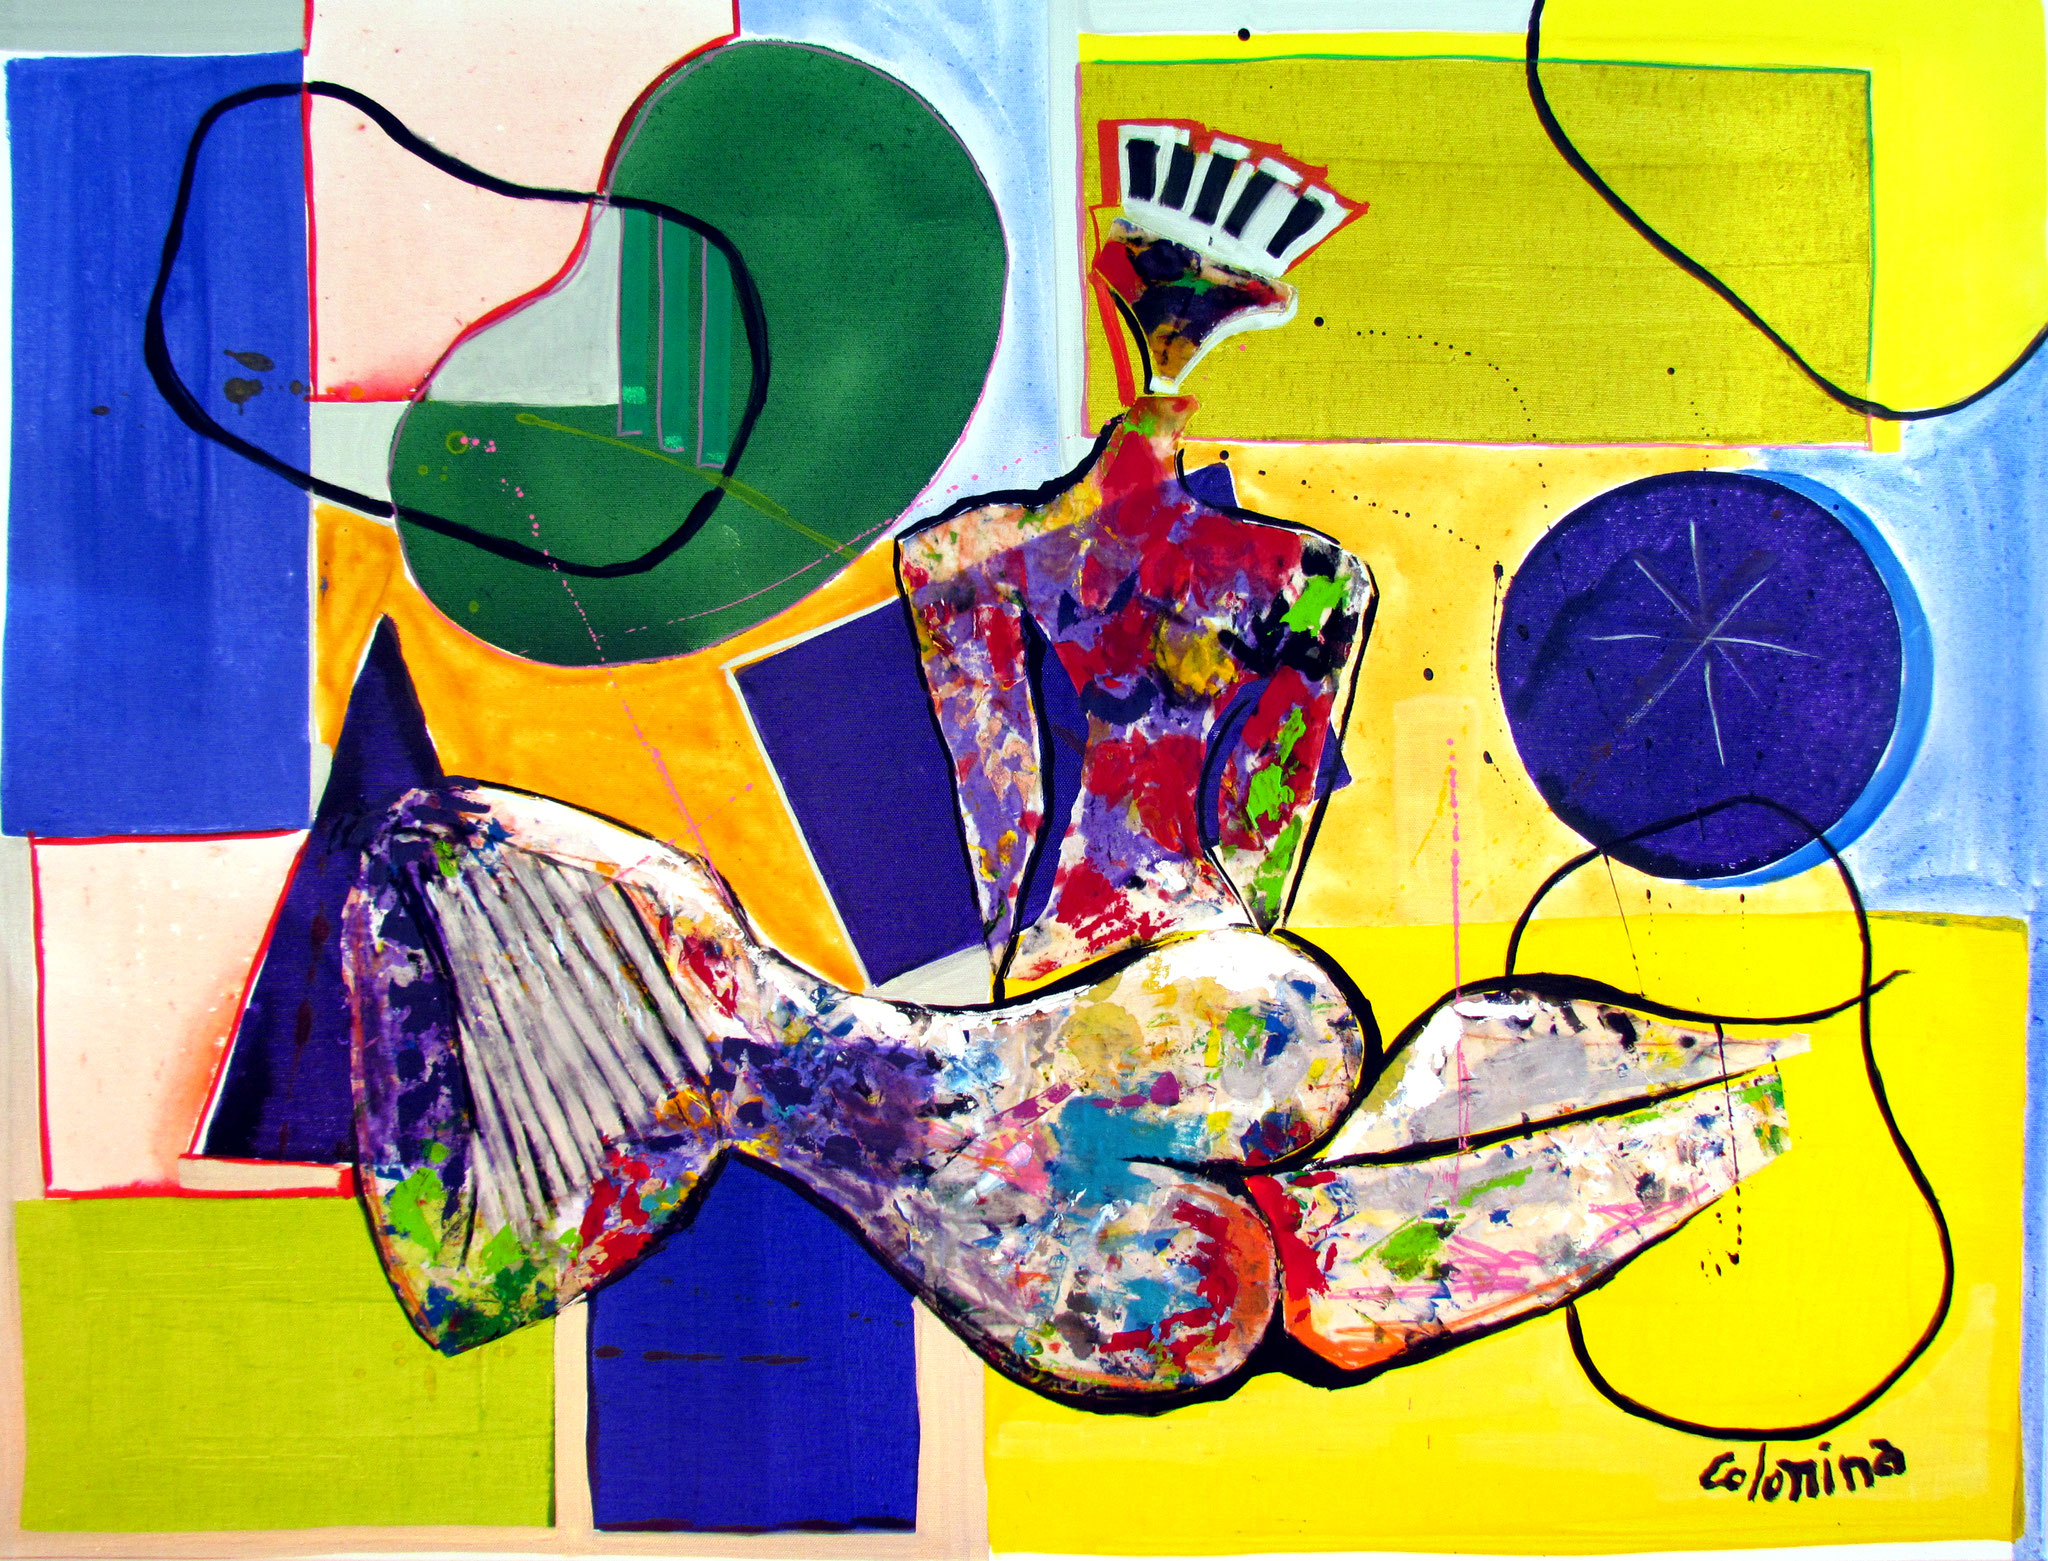 ADMIRATION - Dimensions 116 x 89 cm